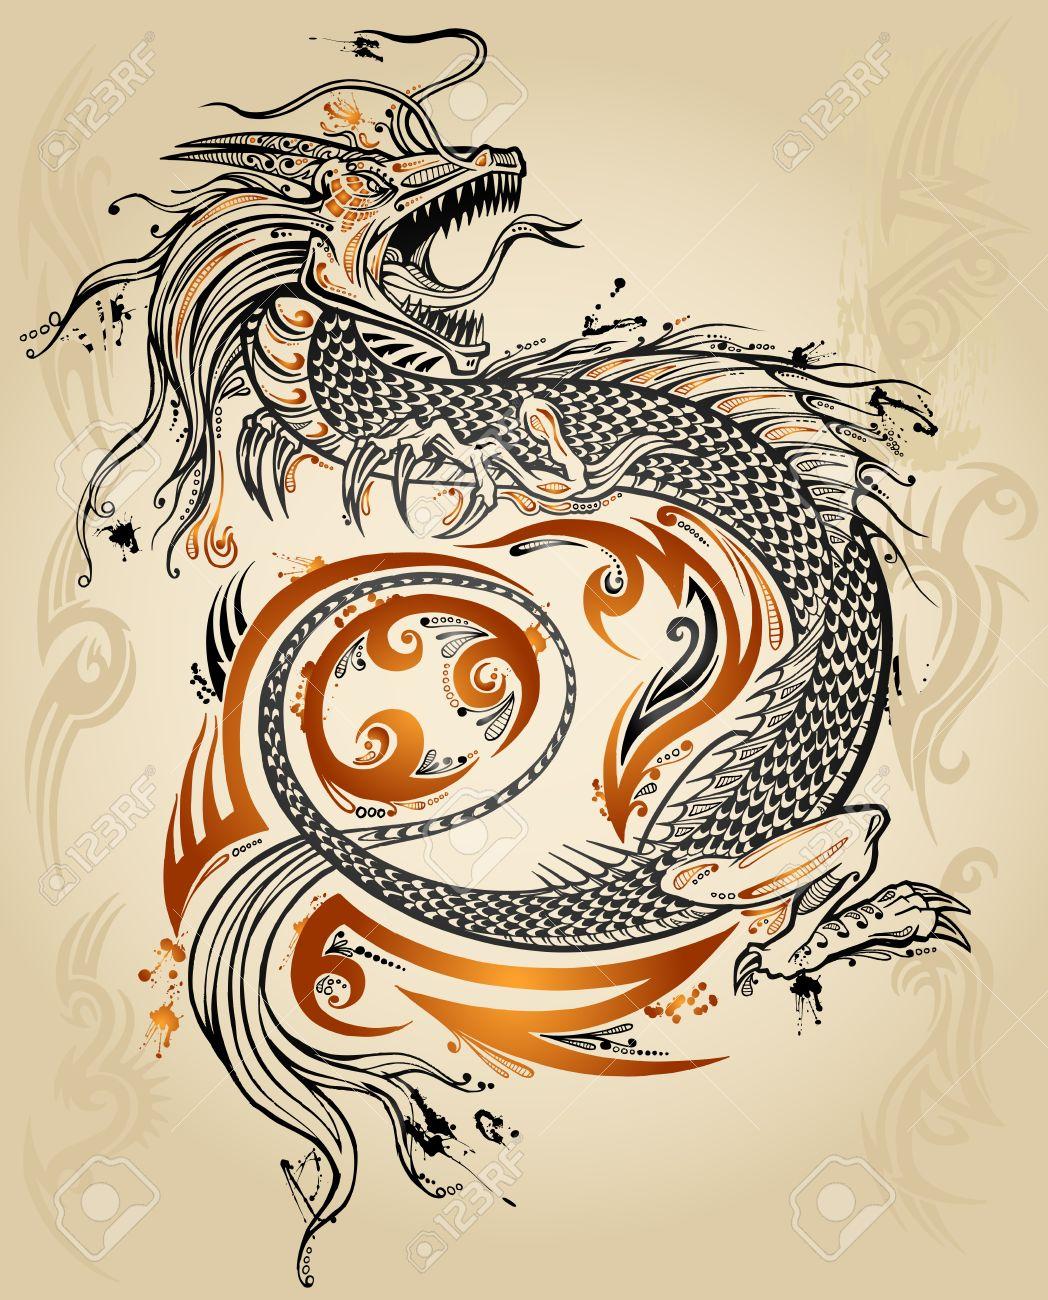 Dragon Doodle Sketch Tattoo Icon Tribal grunge Vector Illustration Art - 12415054